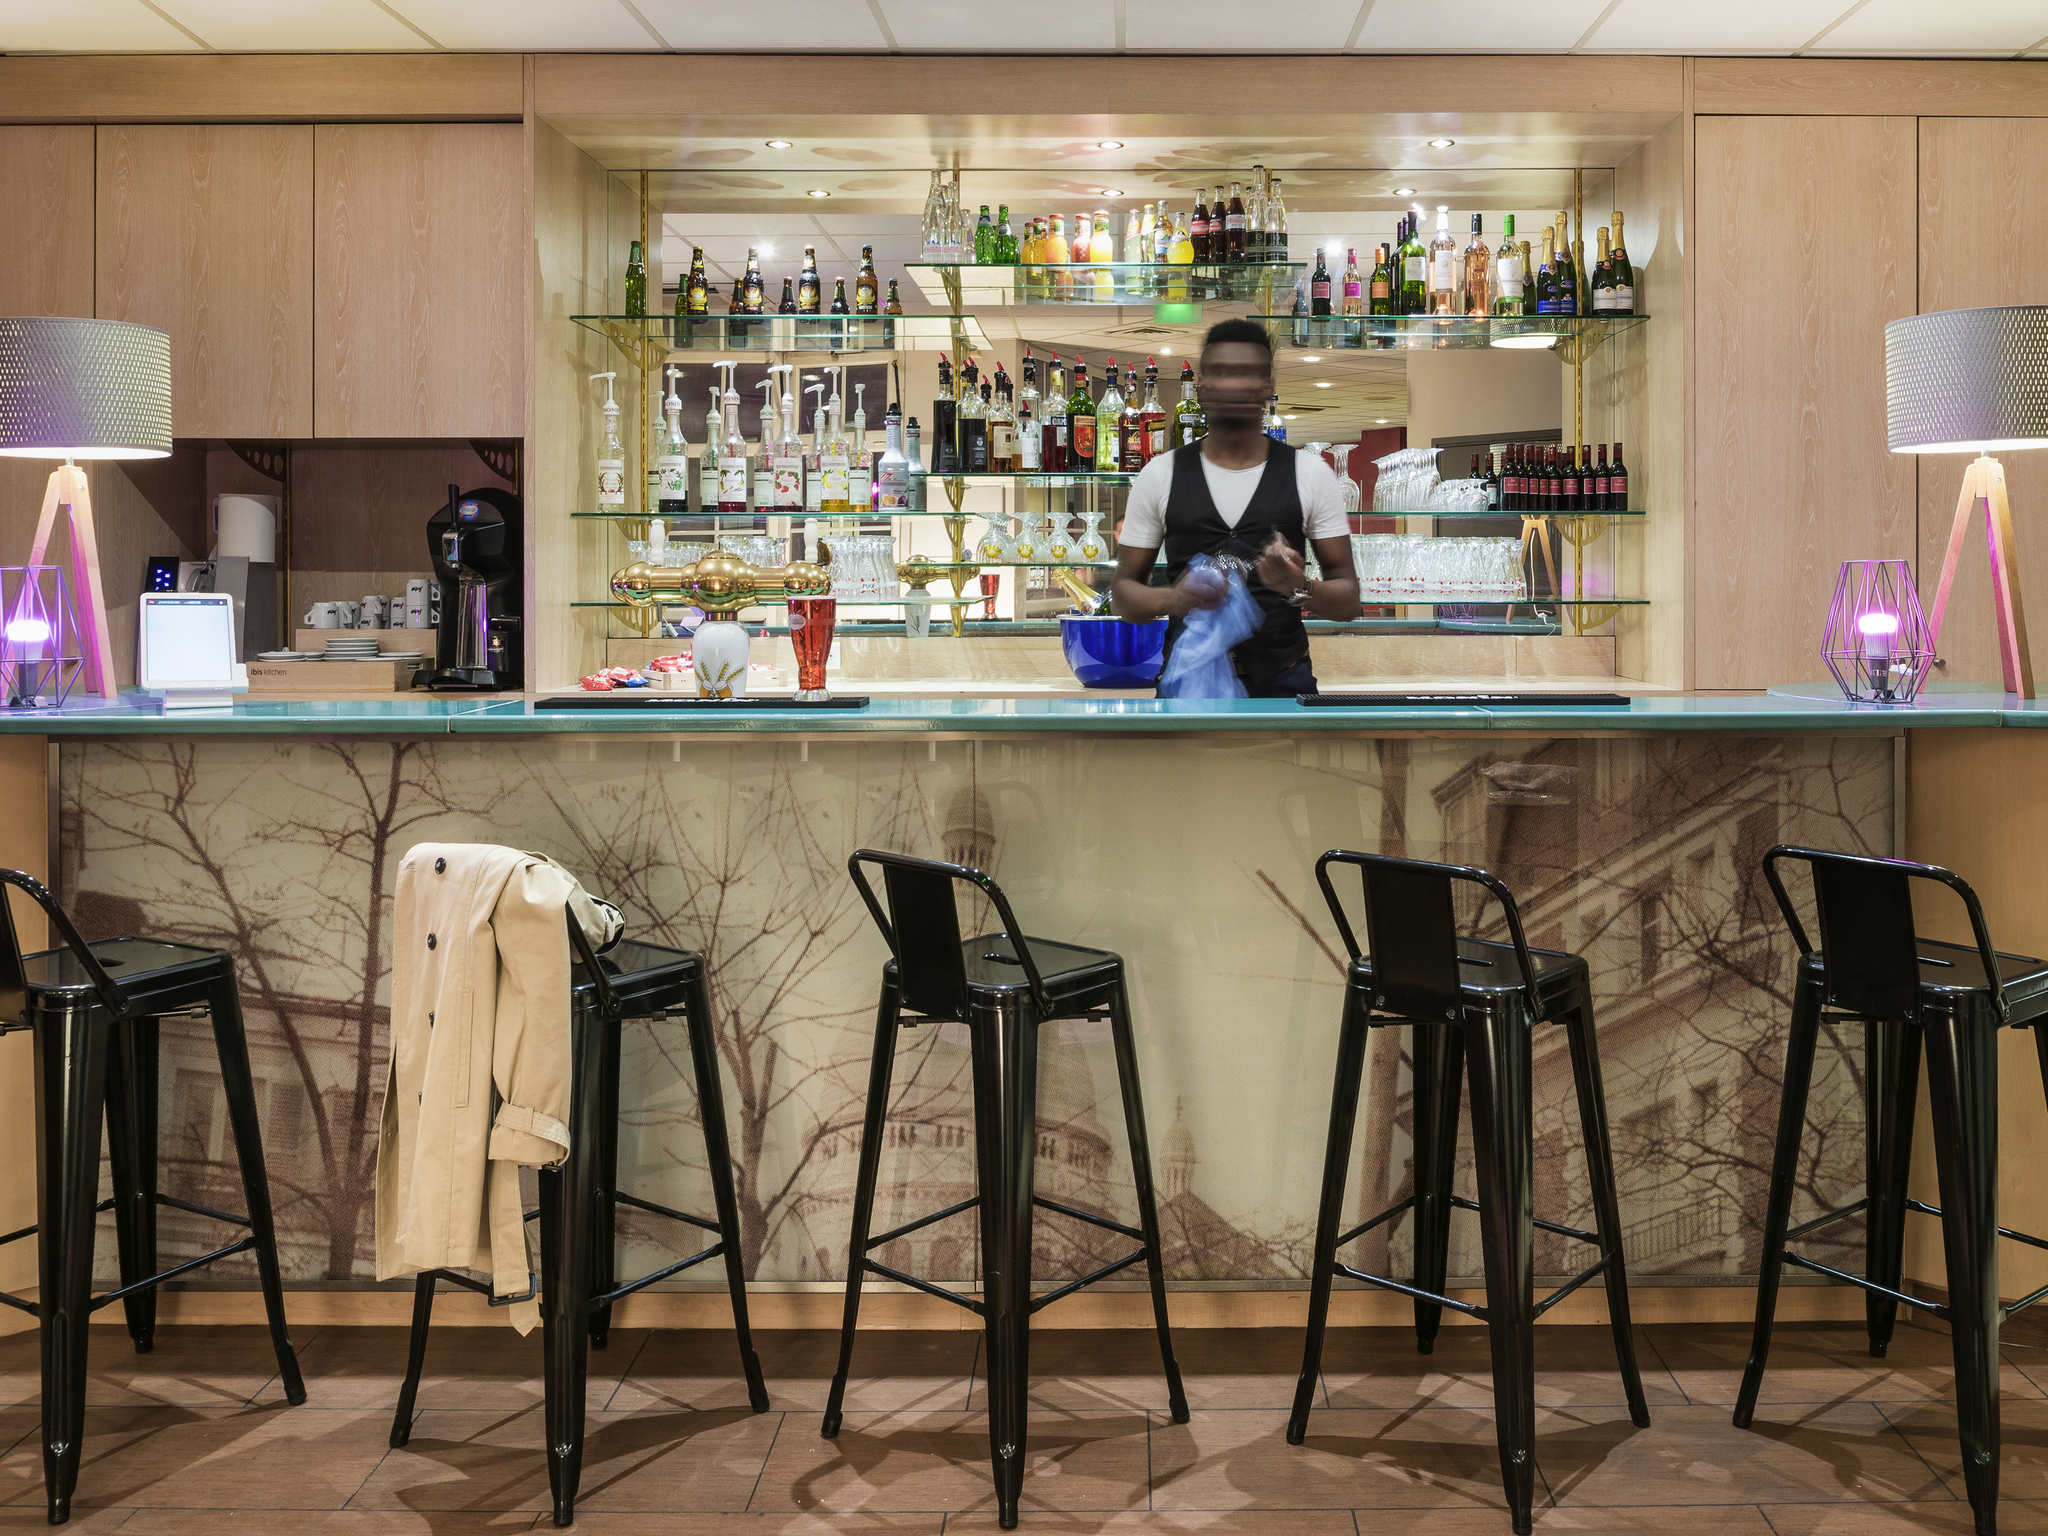 Отель — IBIS Париж Орнано Монмартр Норд 18 округ